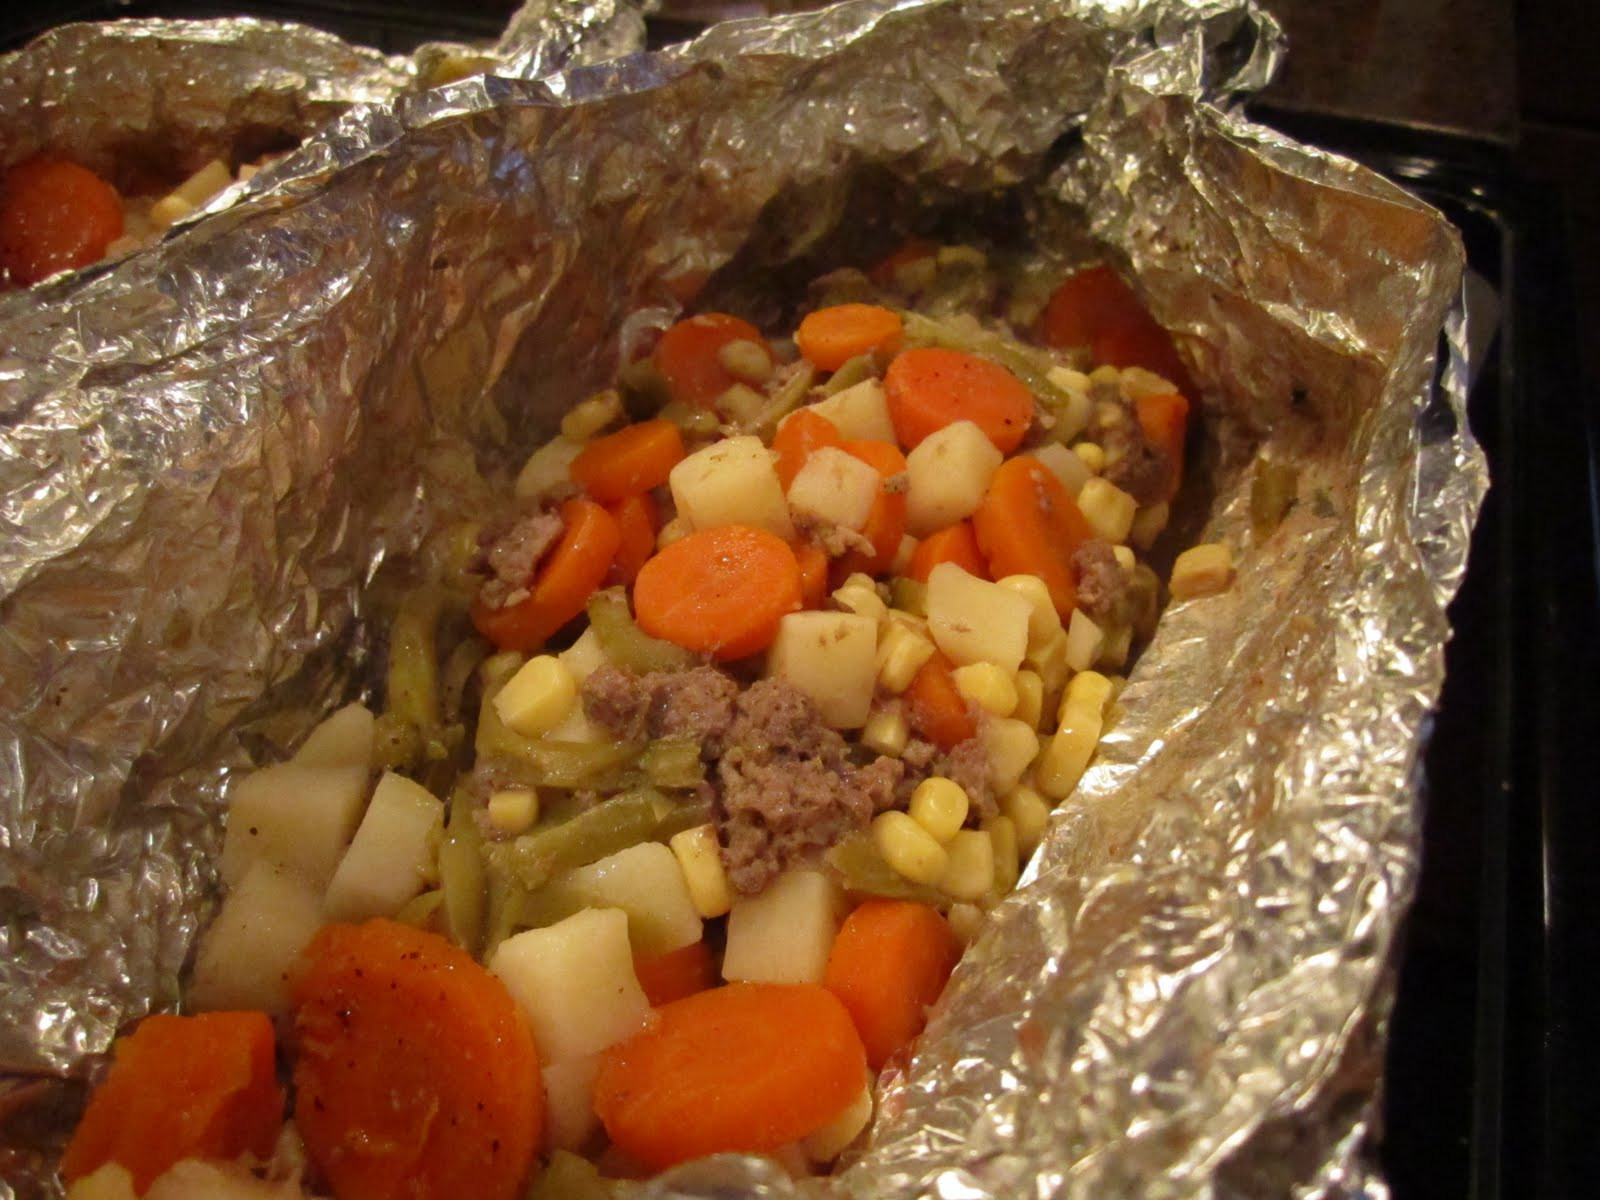 Hobo Dinners Camping  Recipes Made My Way Hobo Dinners